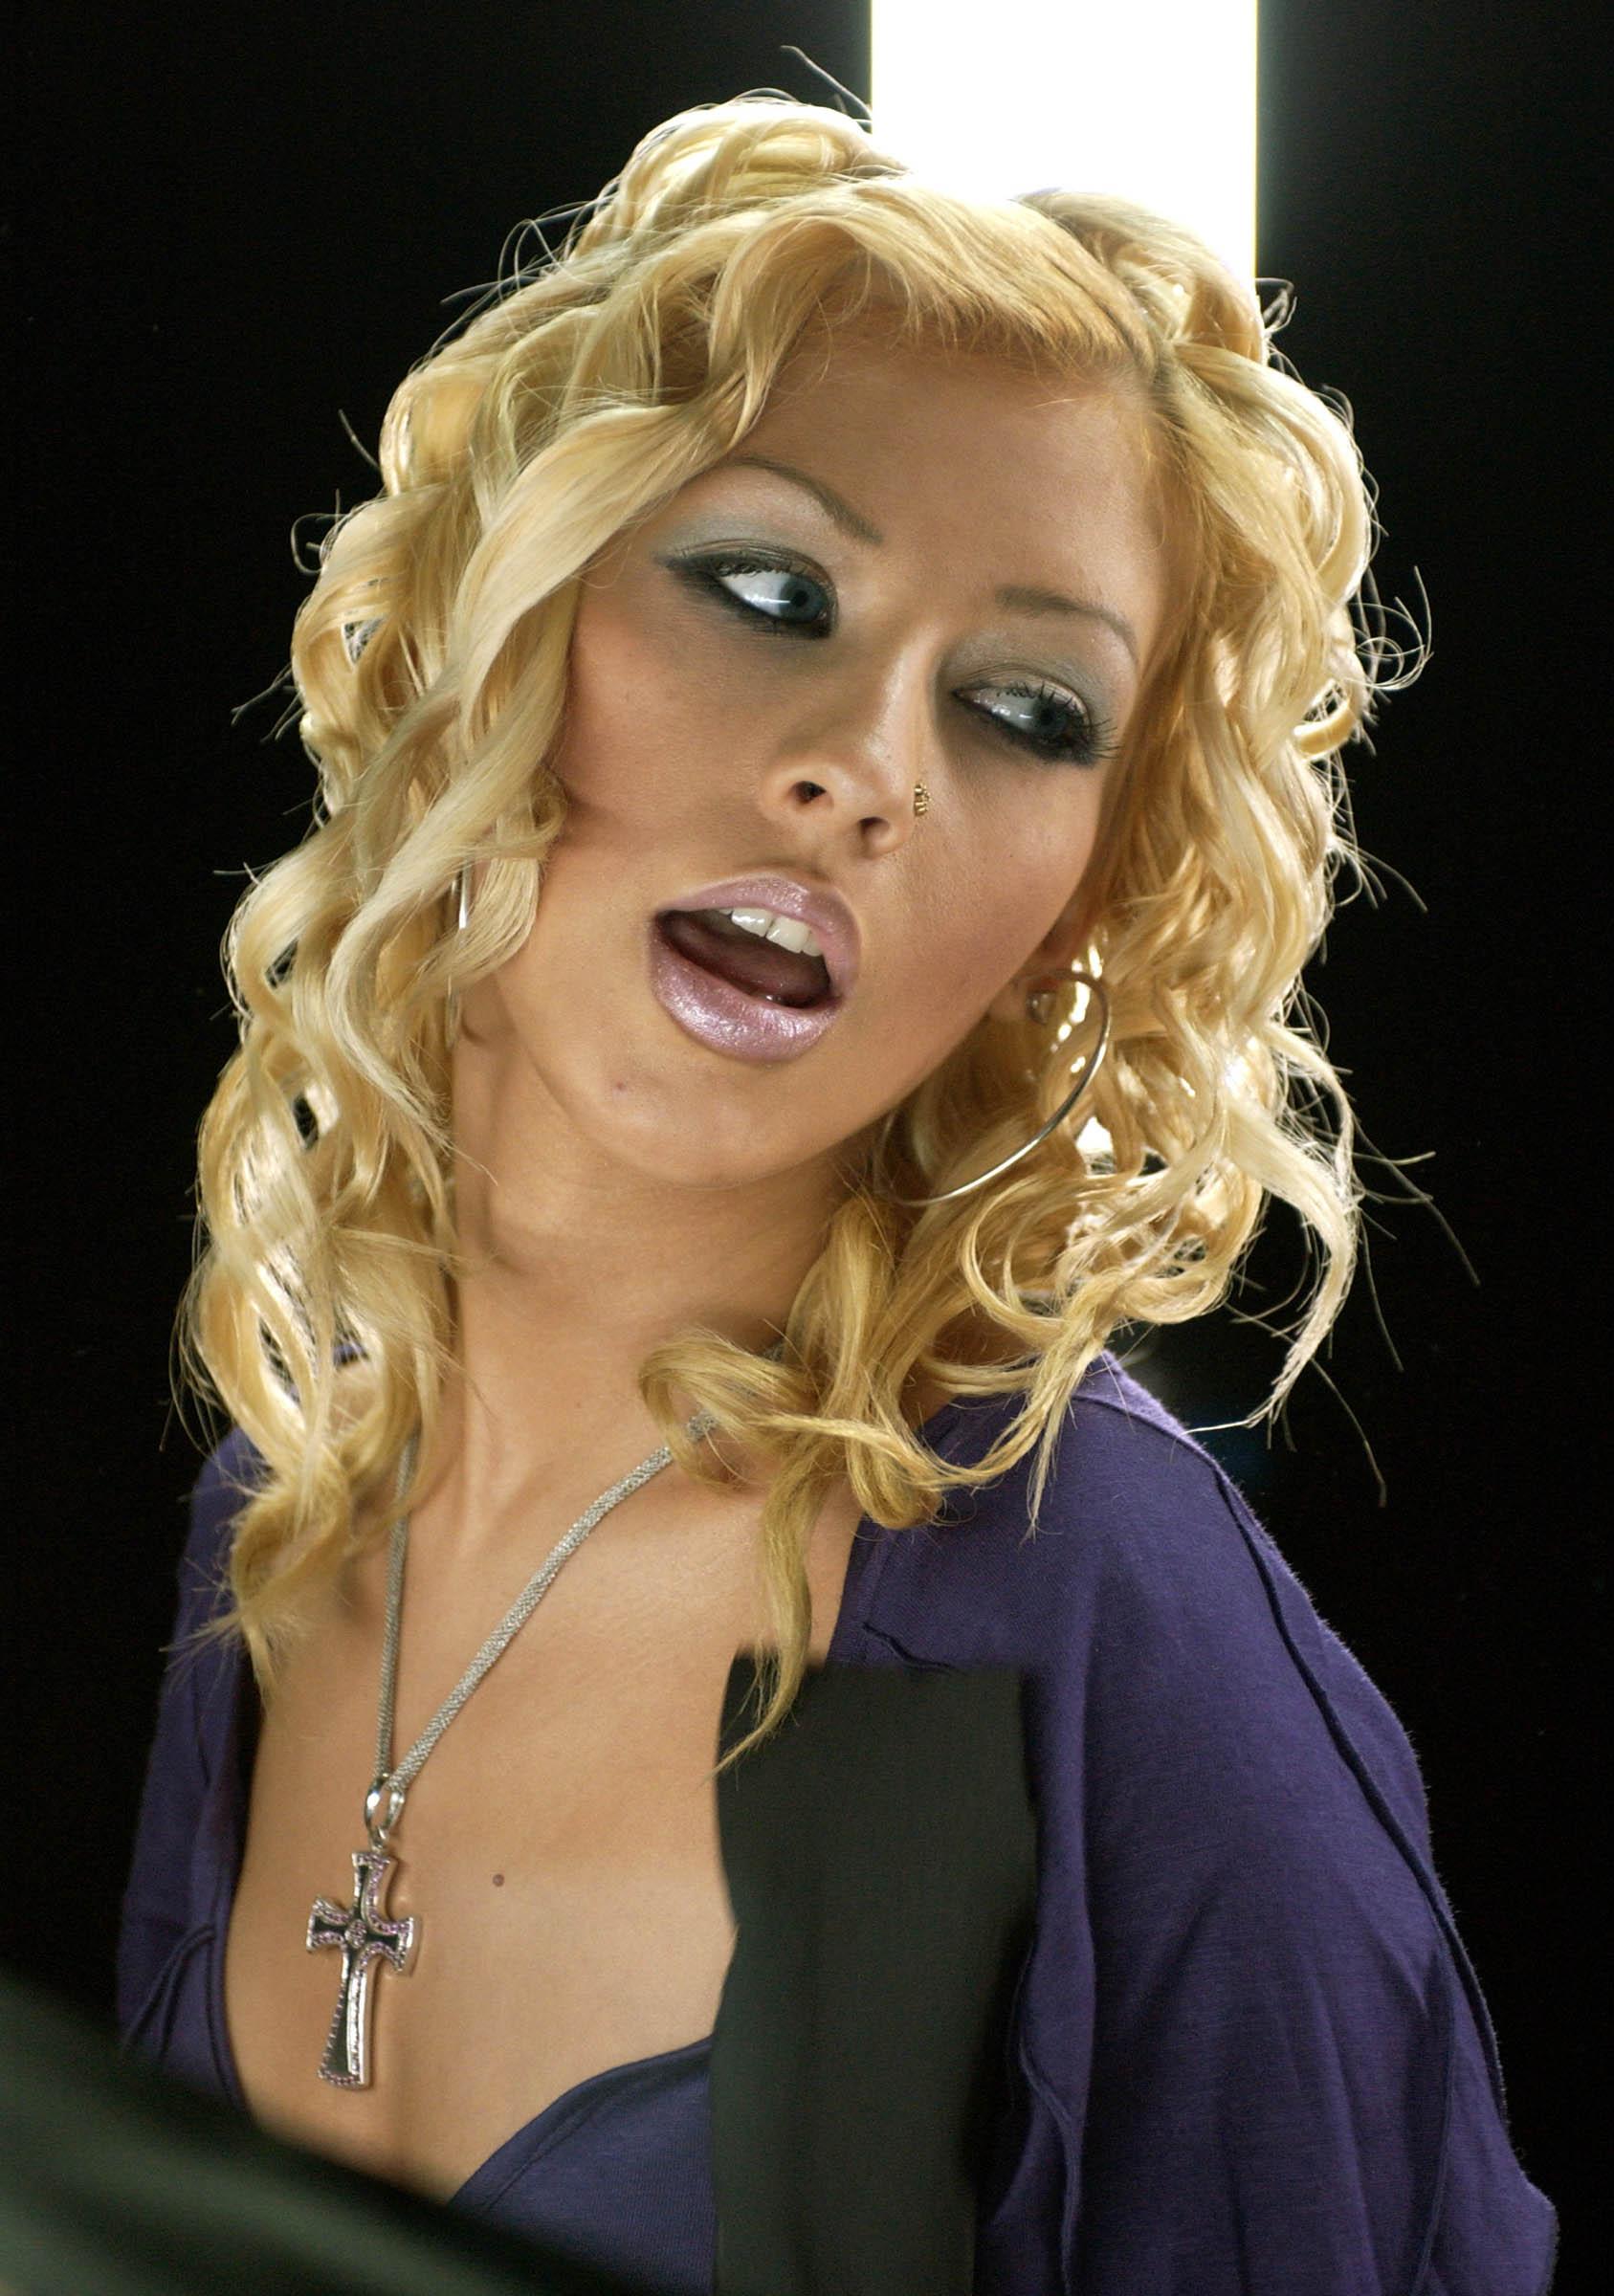 65911_Christina_Aguilera-001823_122_924lo.jpg